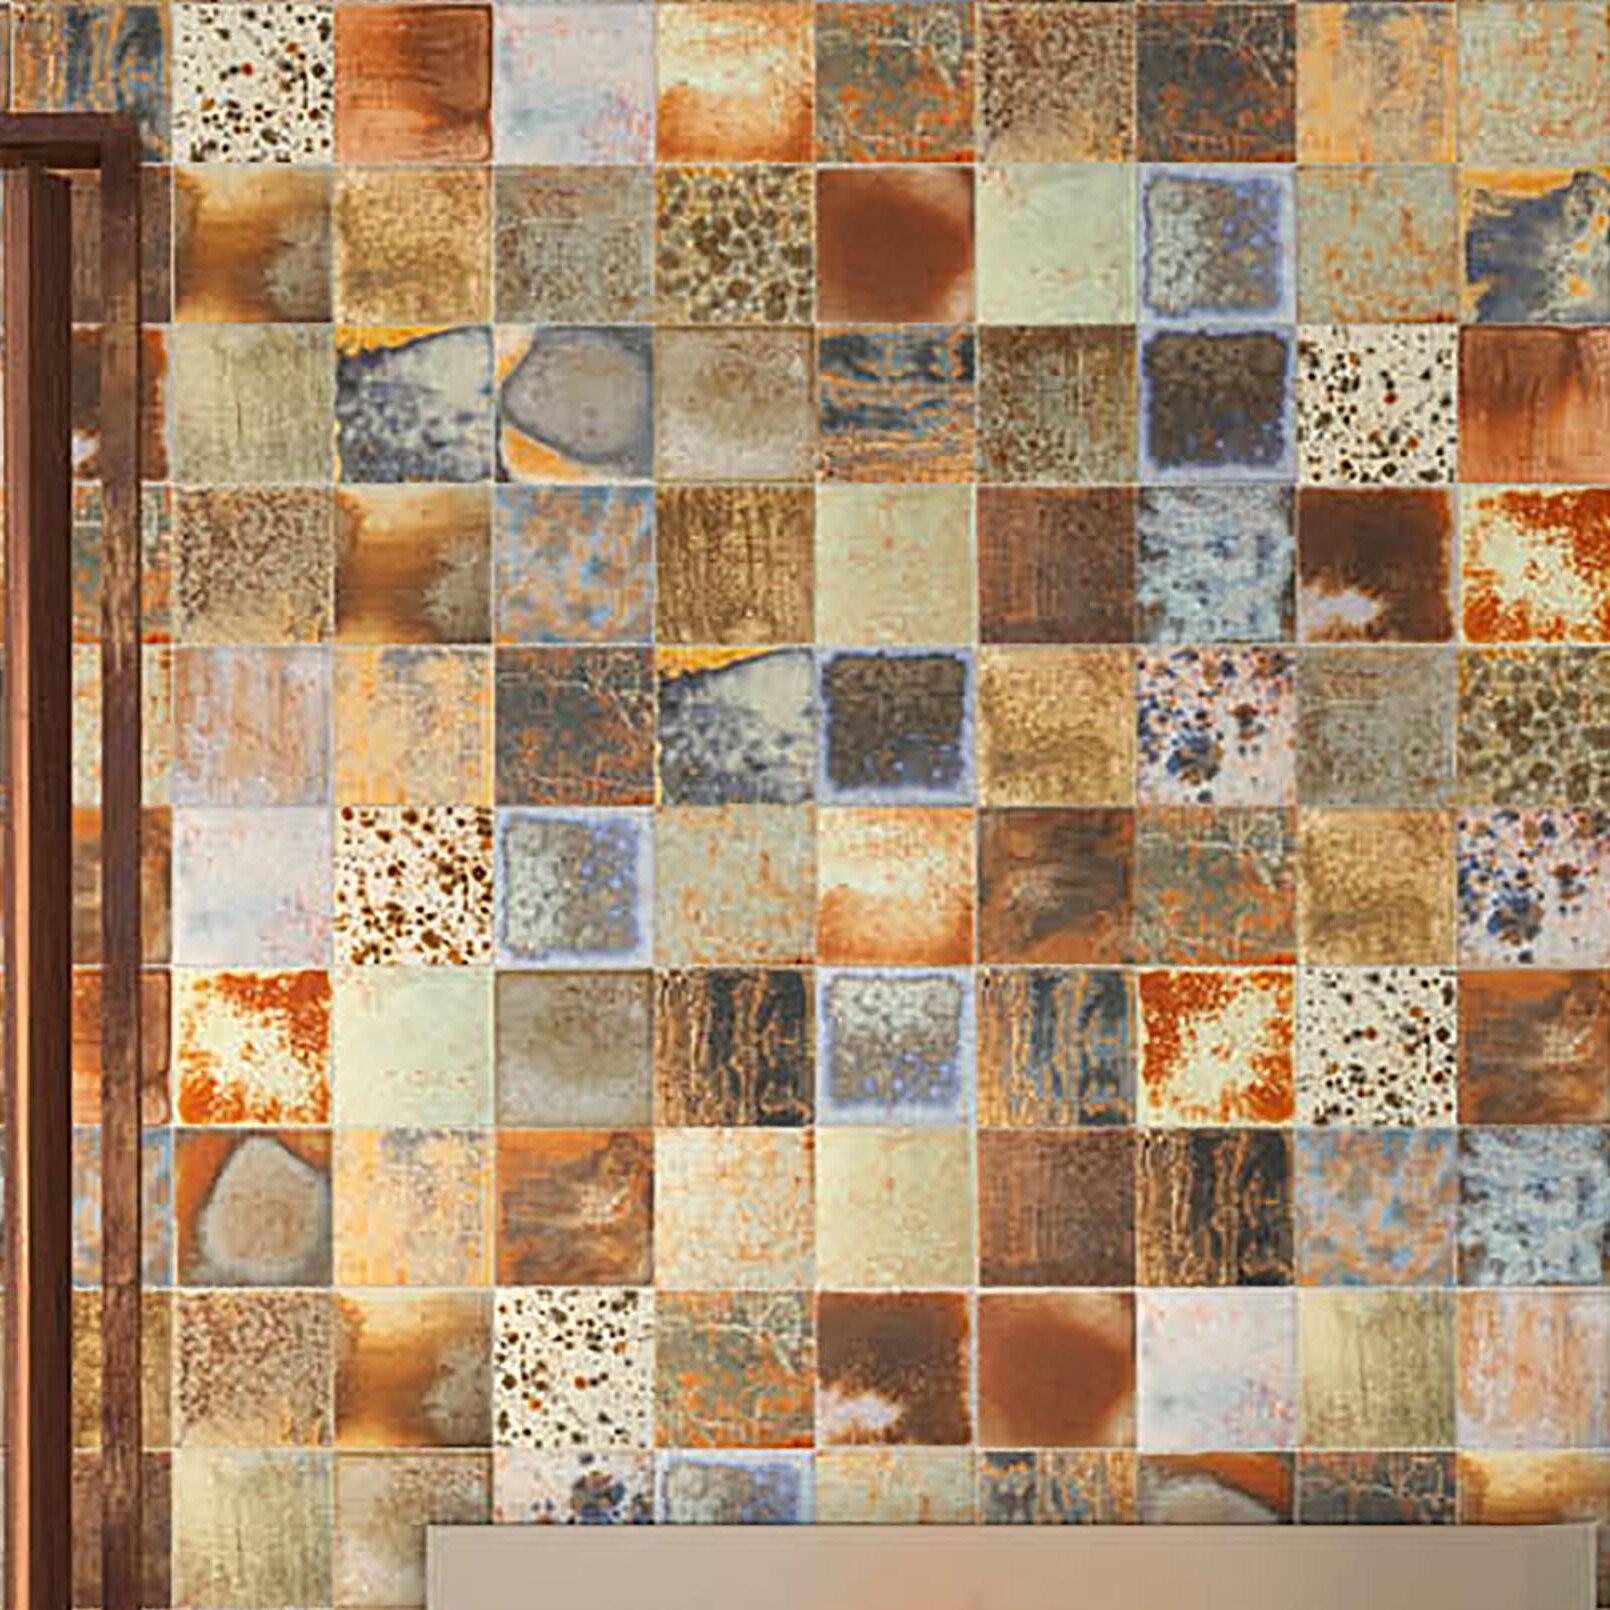 Elitetile Honesty 7 75 X Porcelain Tile In Orange Beige Reviews Wayfair